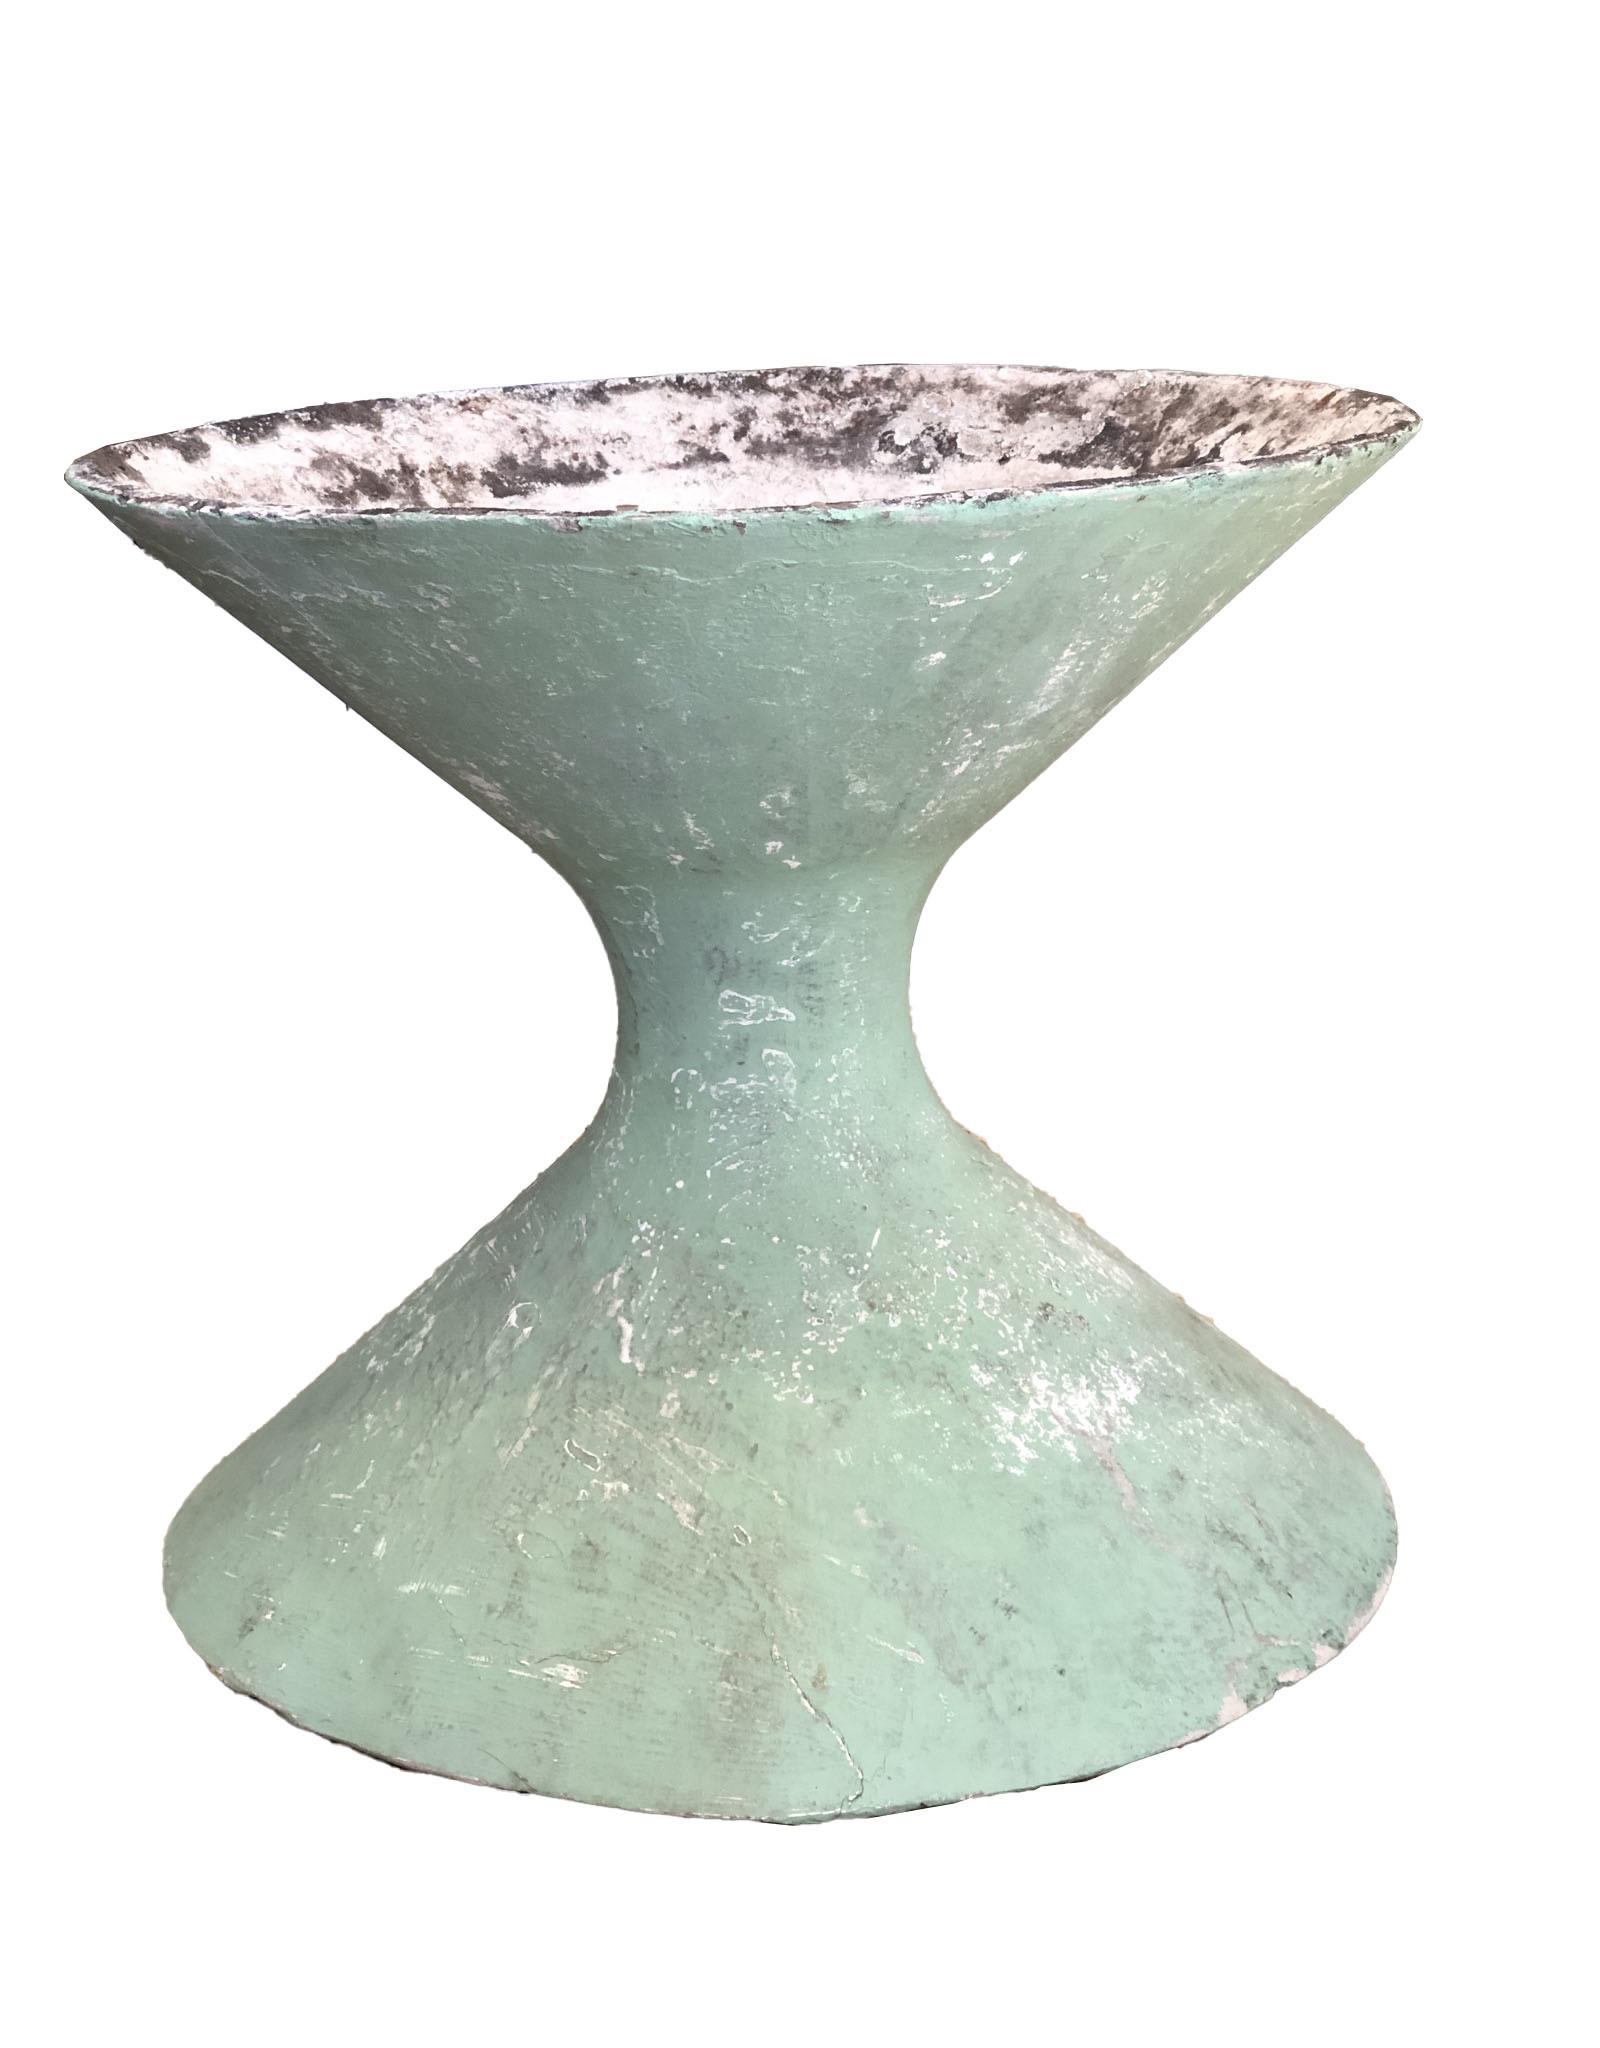 Willy Guhl Sculptural Hourglass Planter in Green